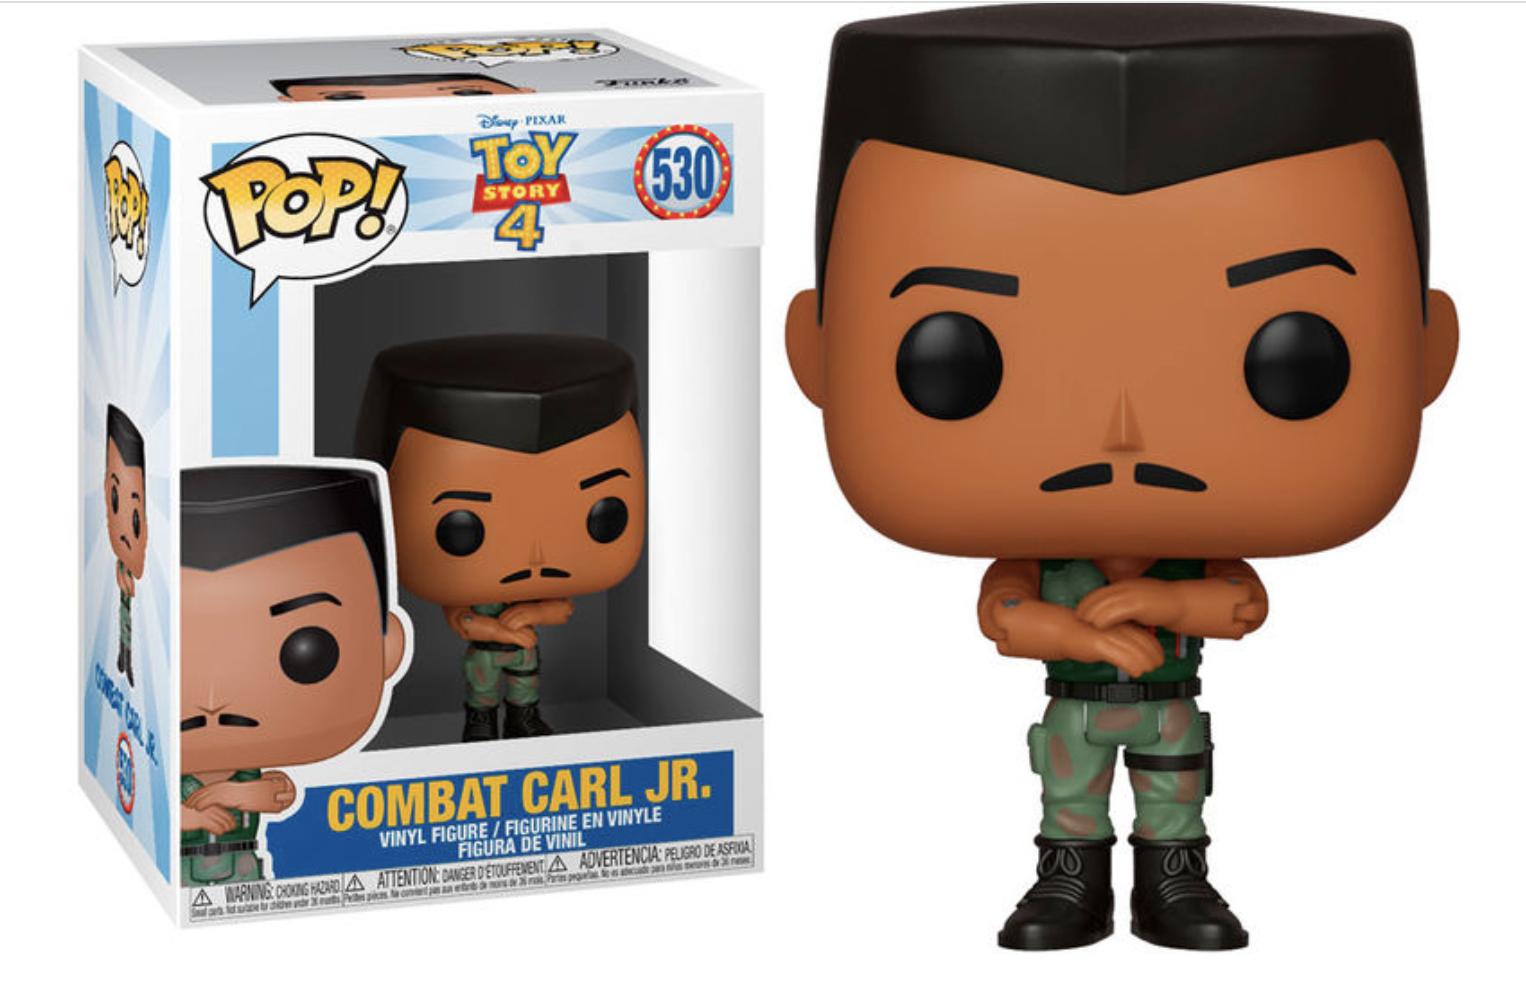 Toy Story 4 - Bobble Head Funko Pop N° 530 : Combat Carl Jr.